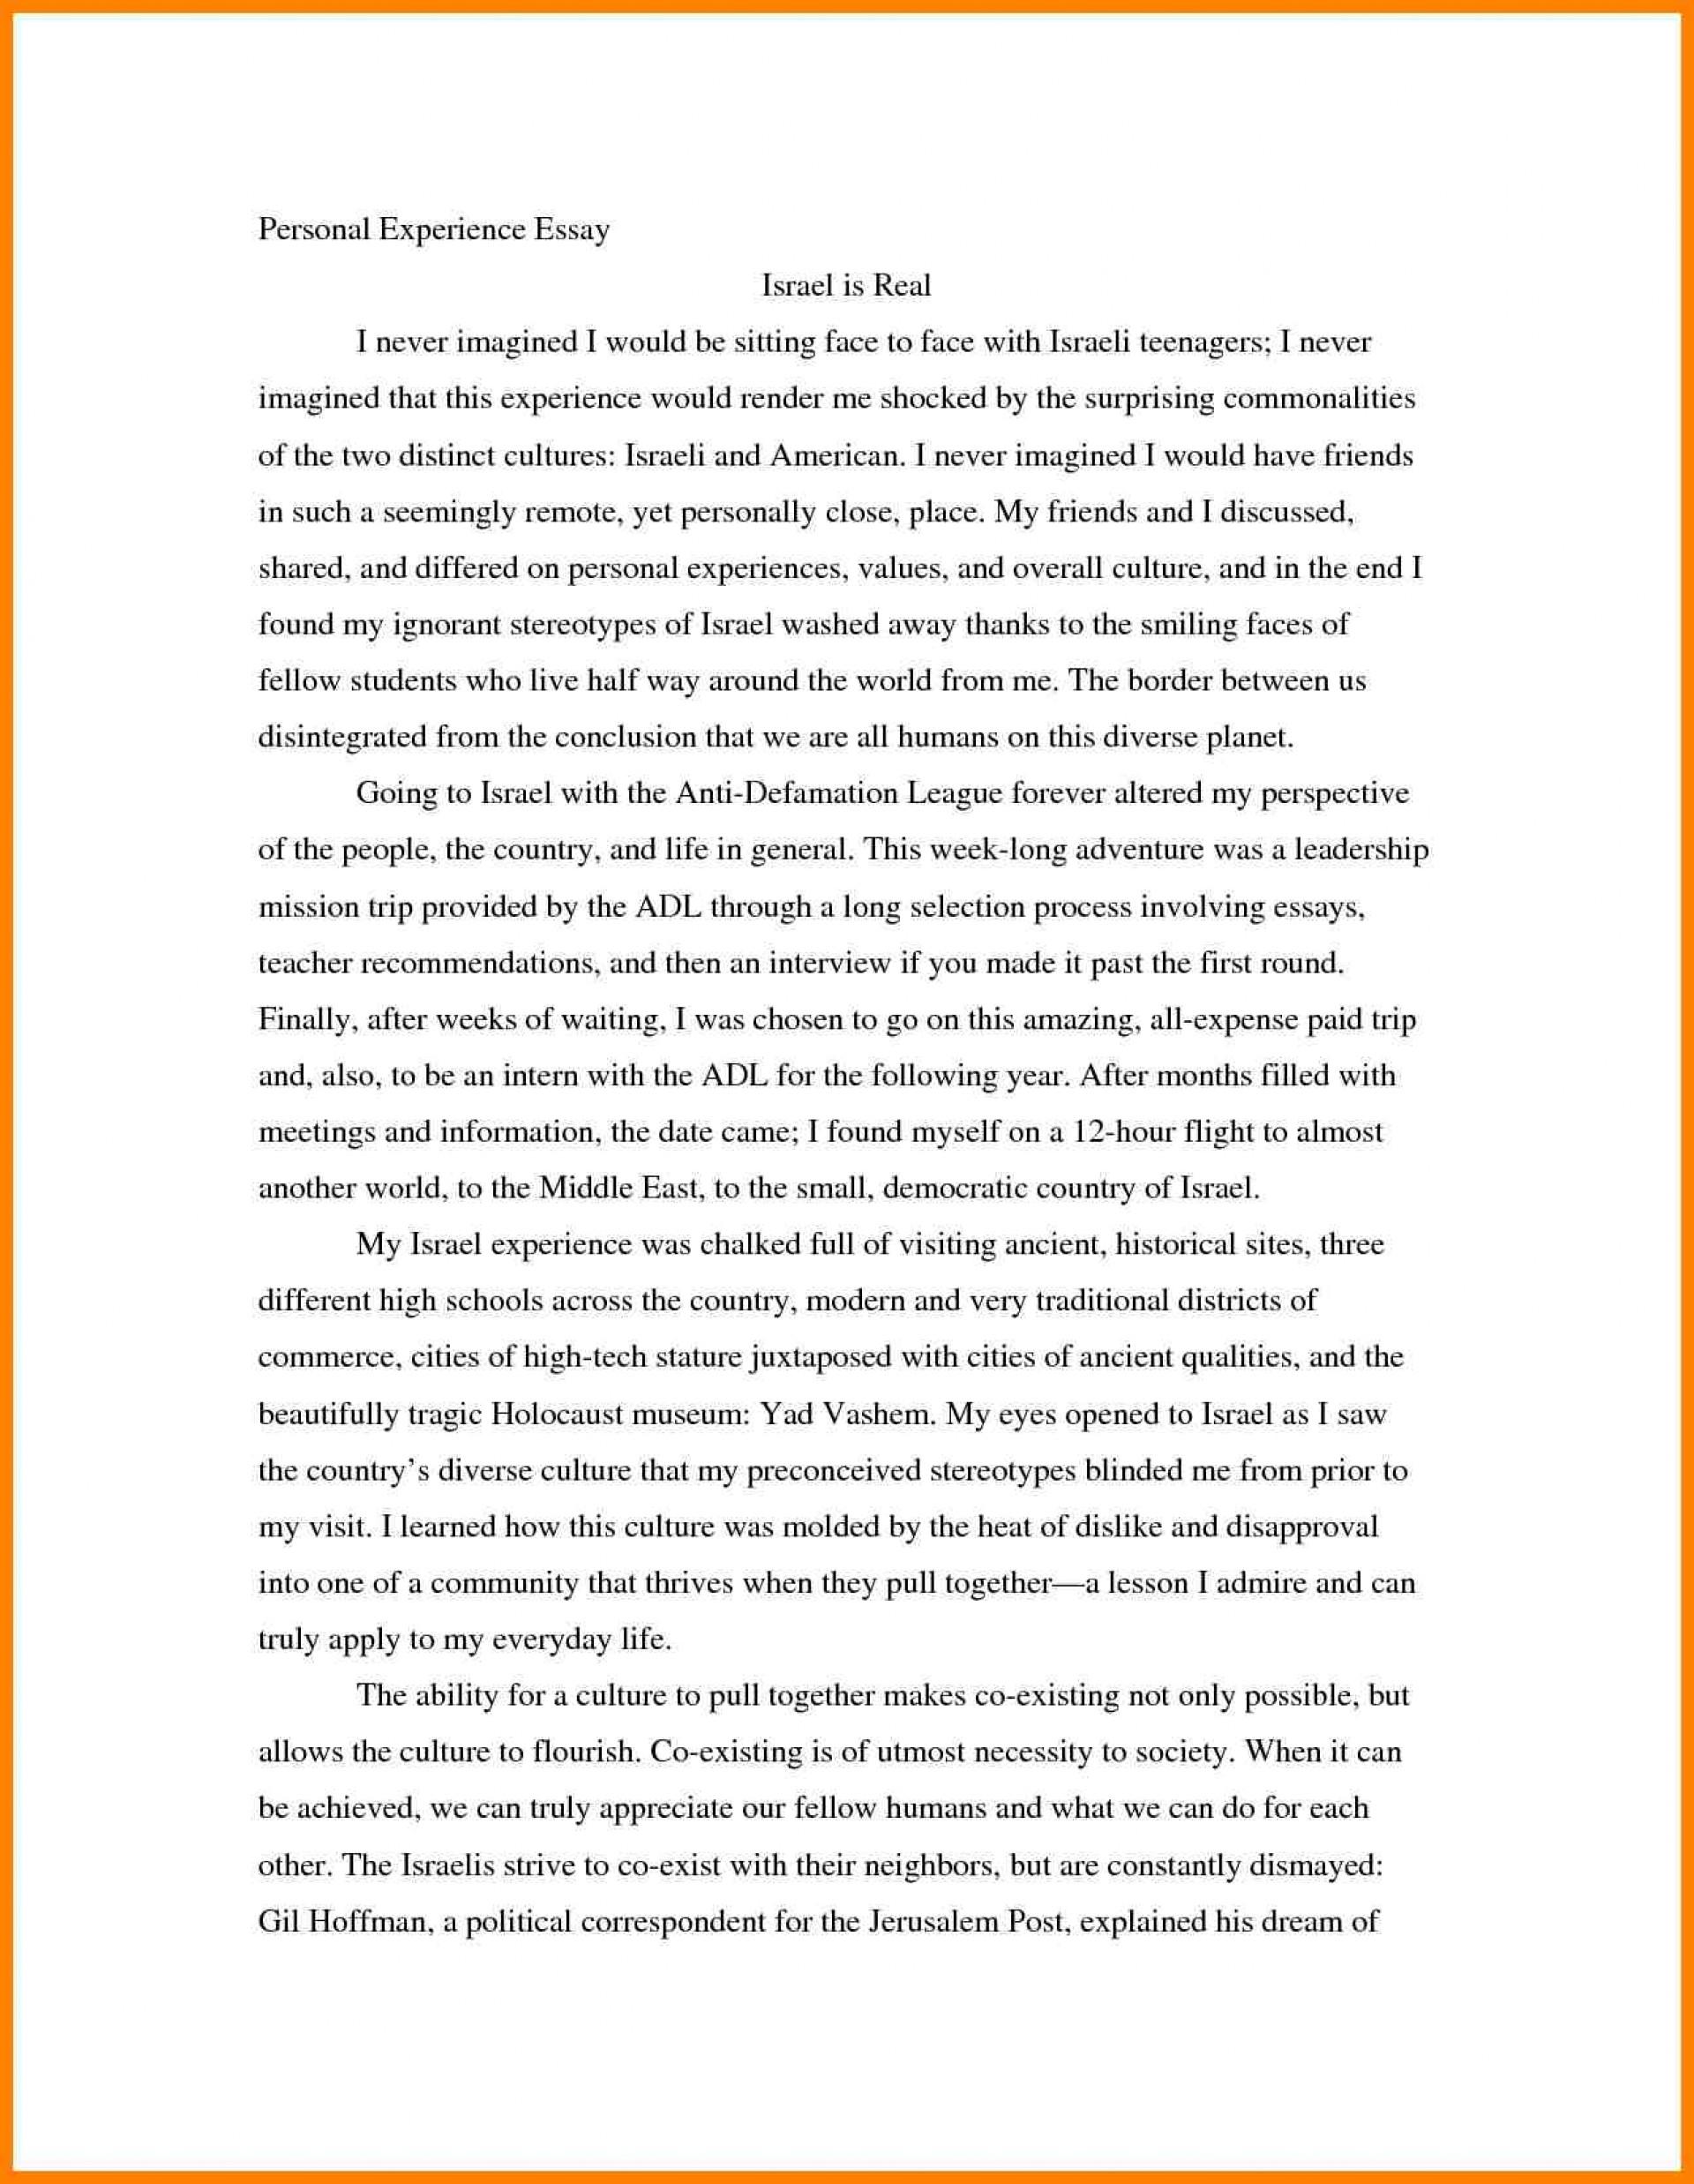 Poster analysis essay